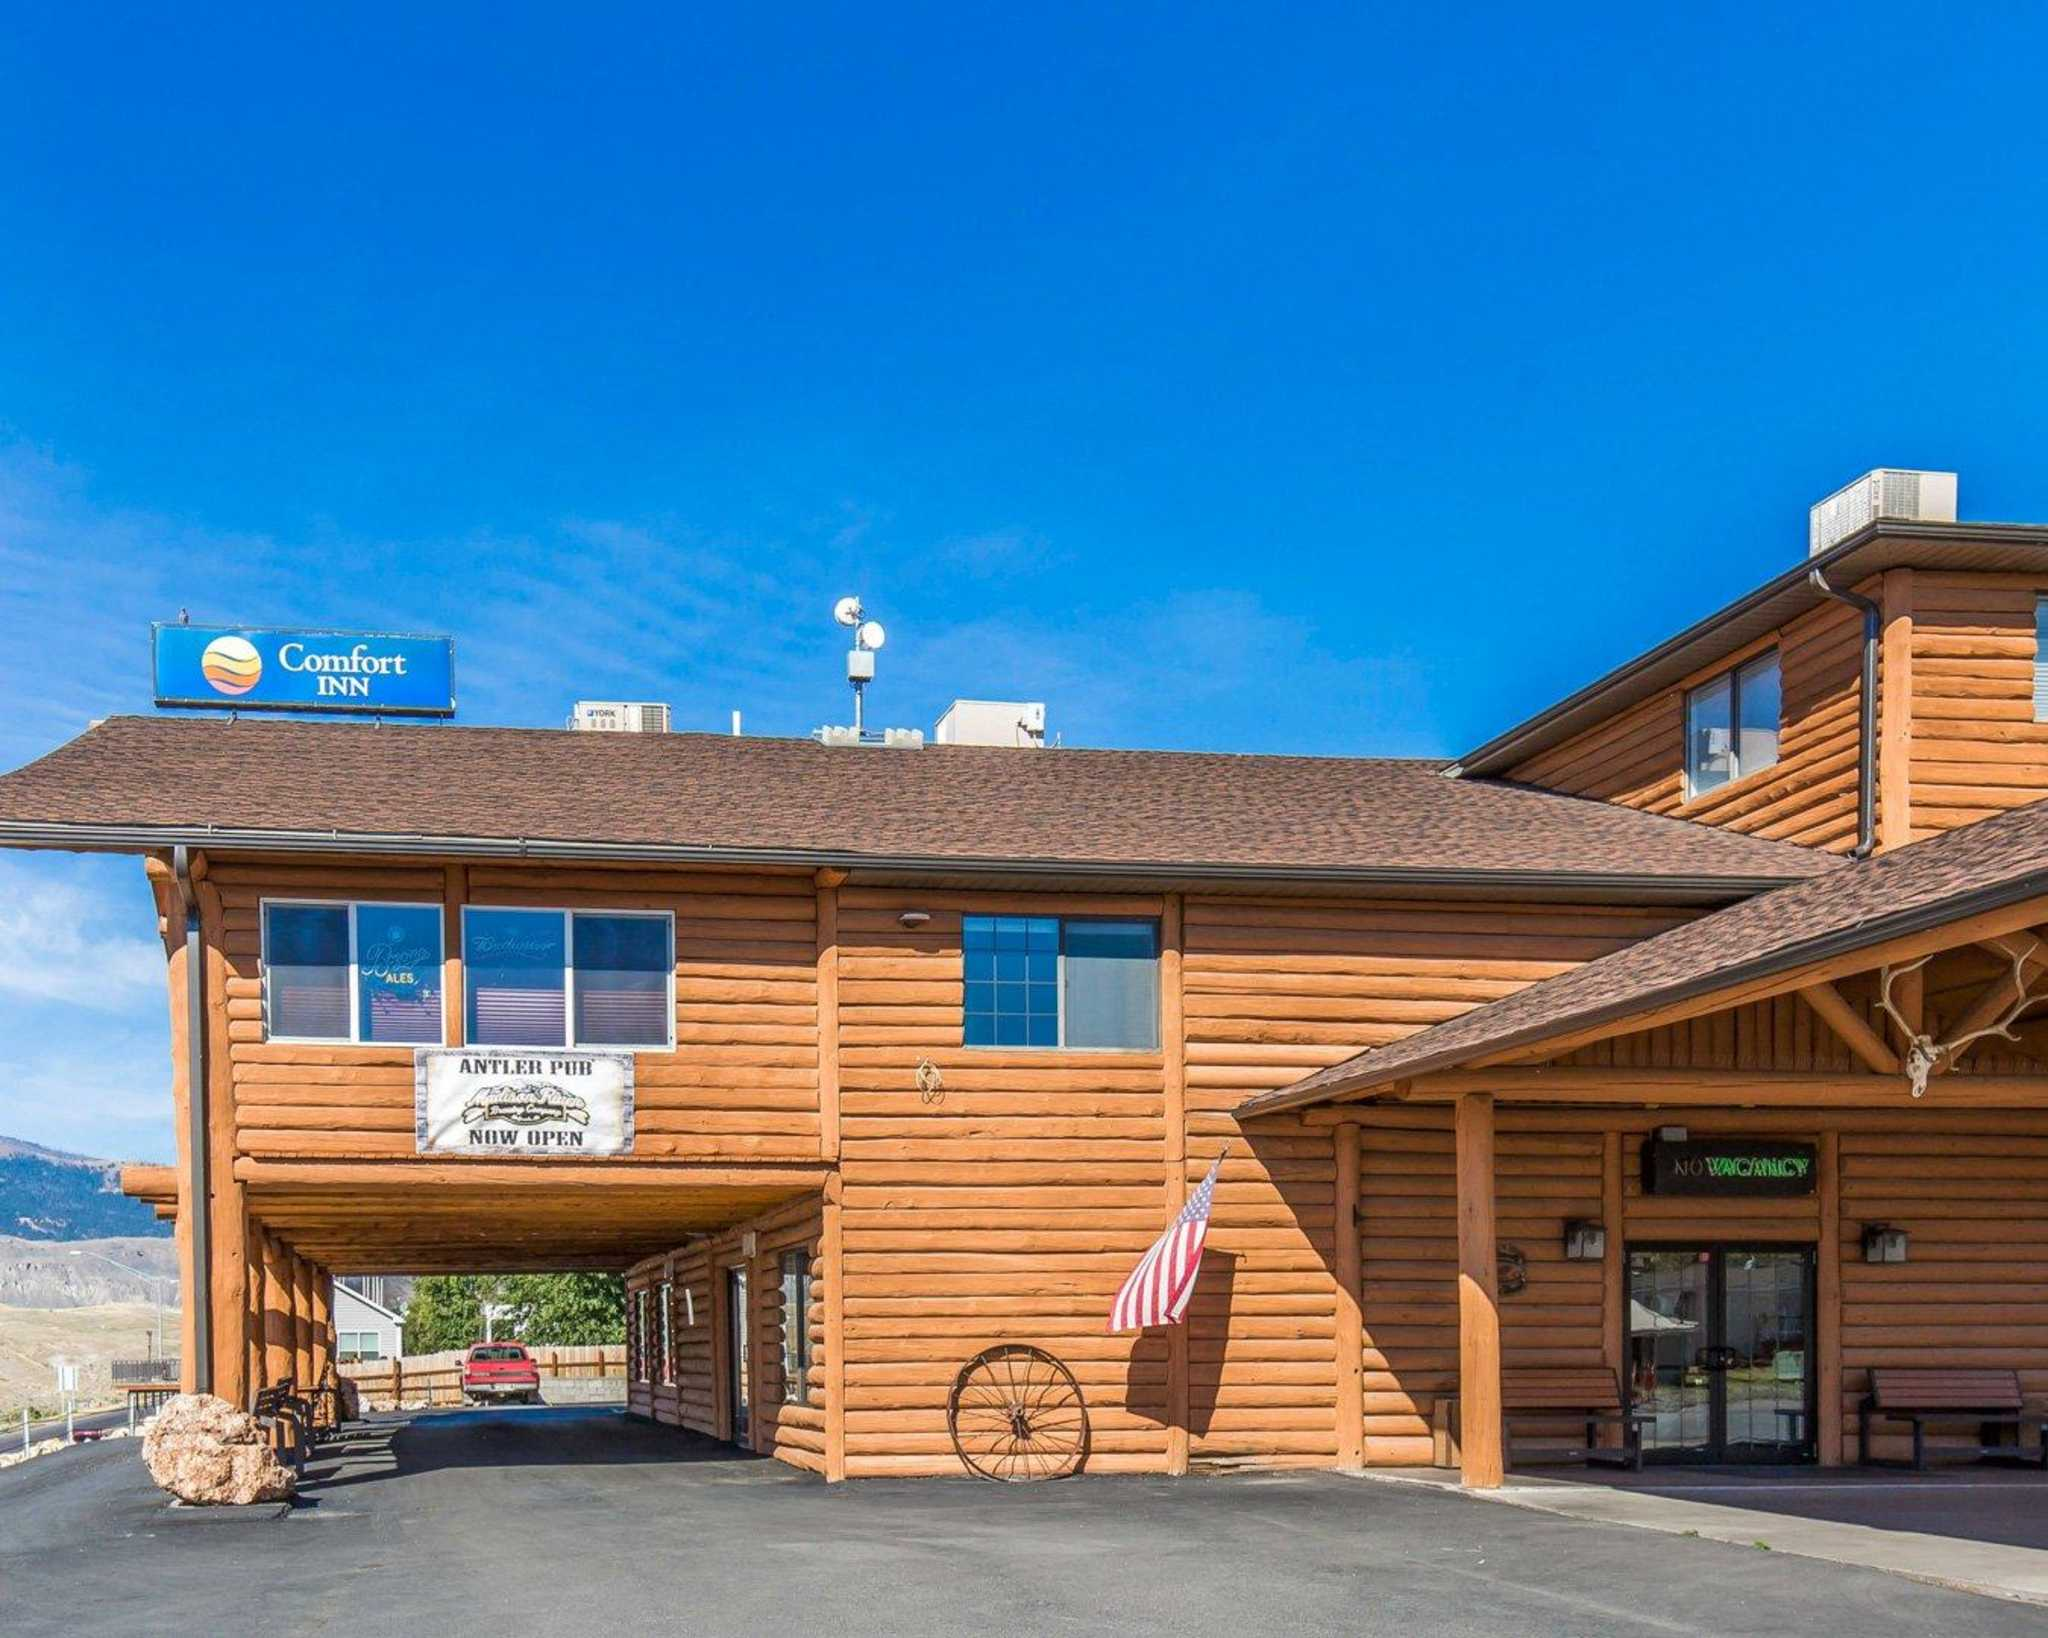 Comfort Inn Yellowstone North image 13